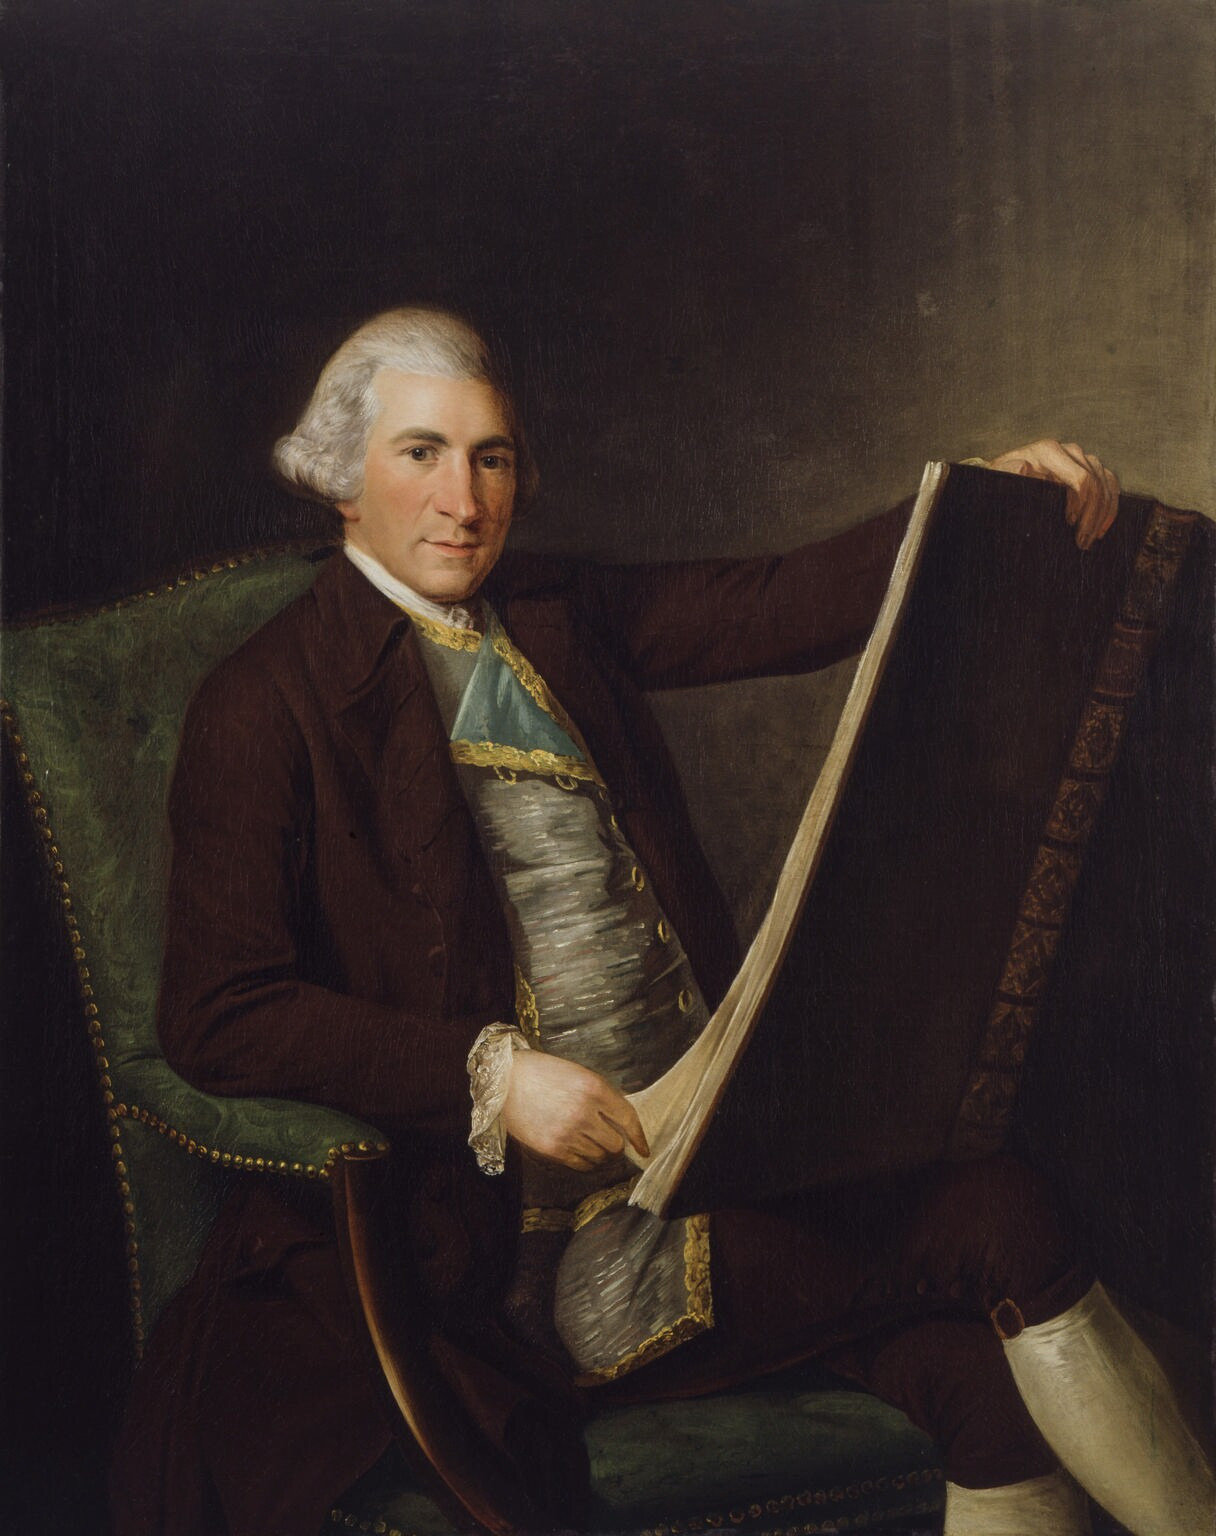 Portrait attributed to [[George Willison (artist)|George Willison]], c. 1770–1775